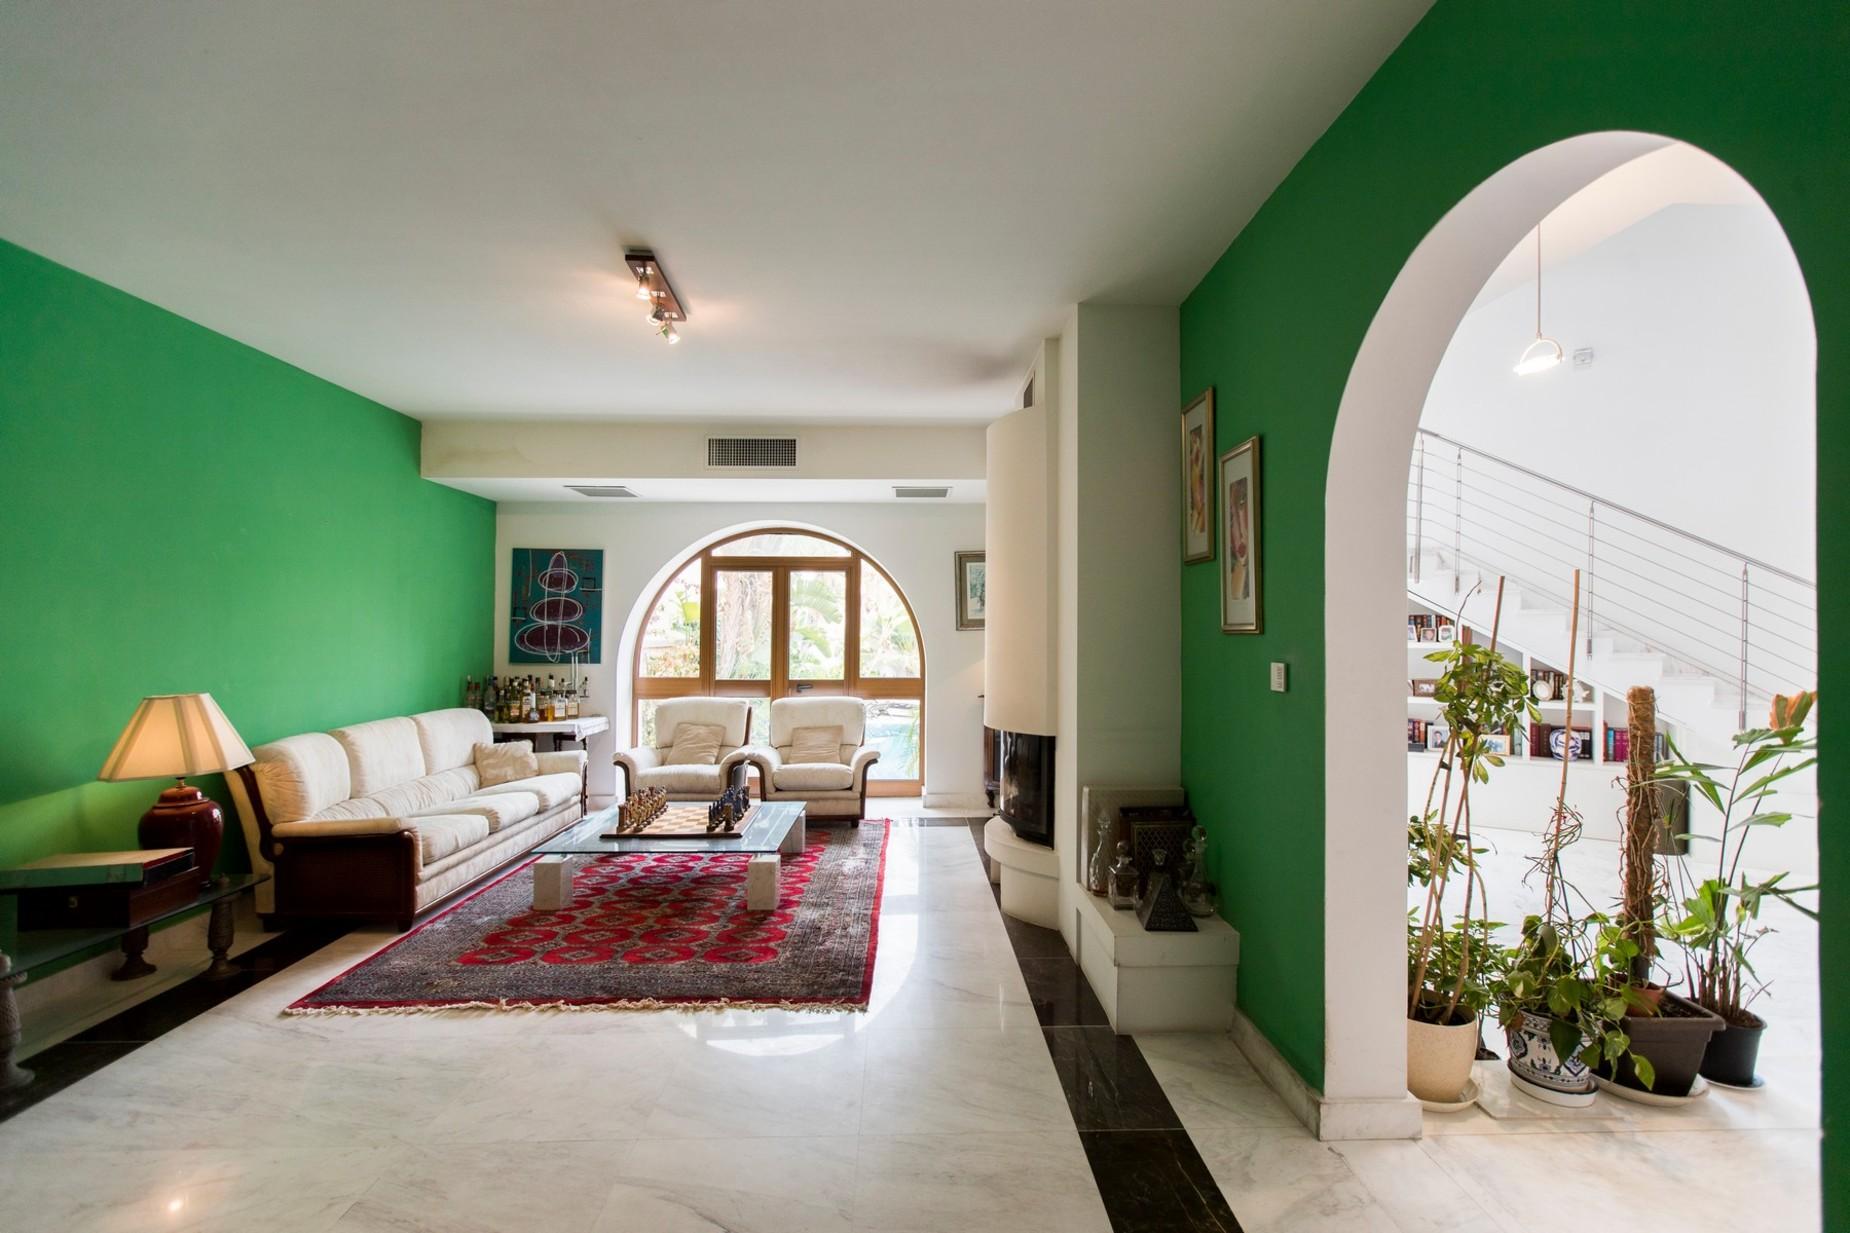 4 bed Villa For Rent in Naxxar, Naxxar - thumb 7